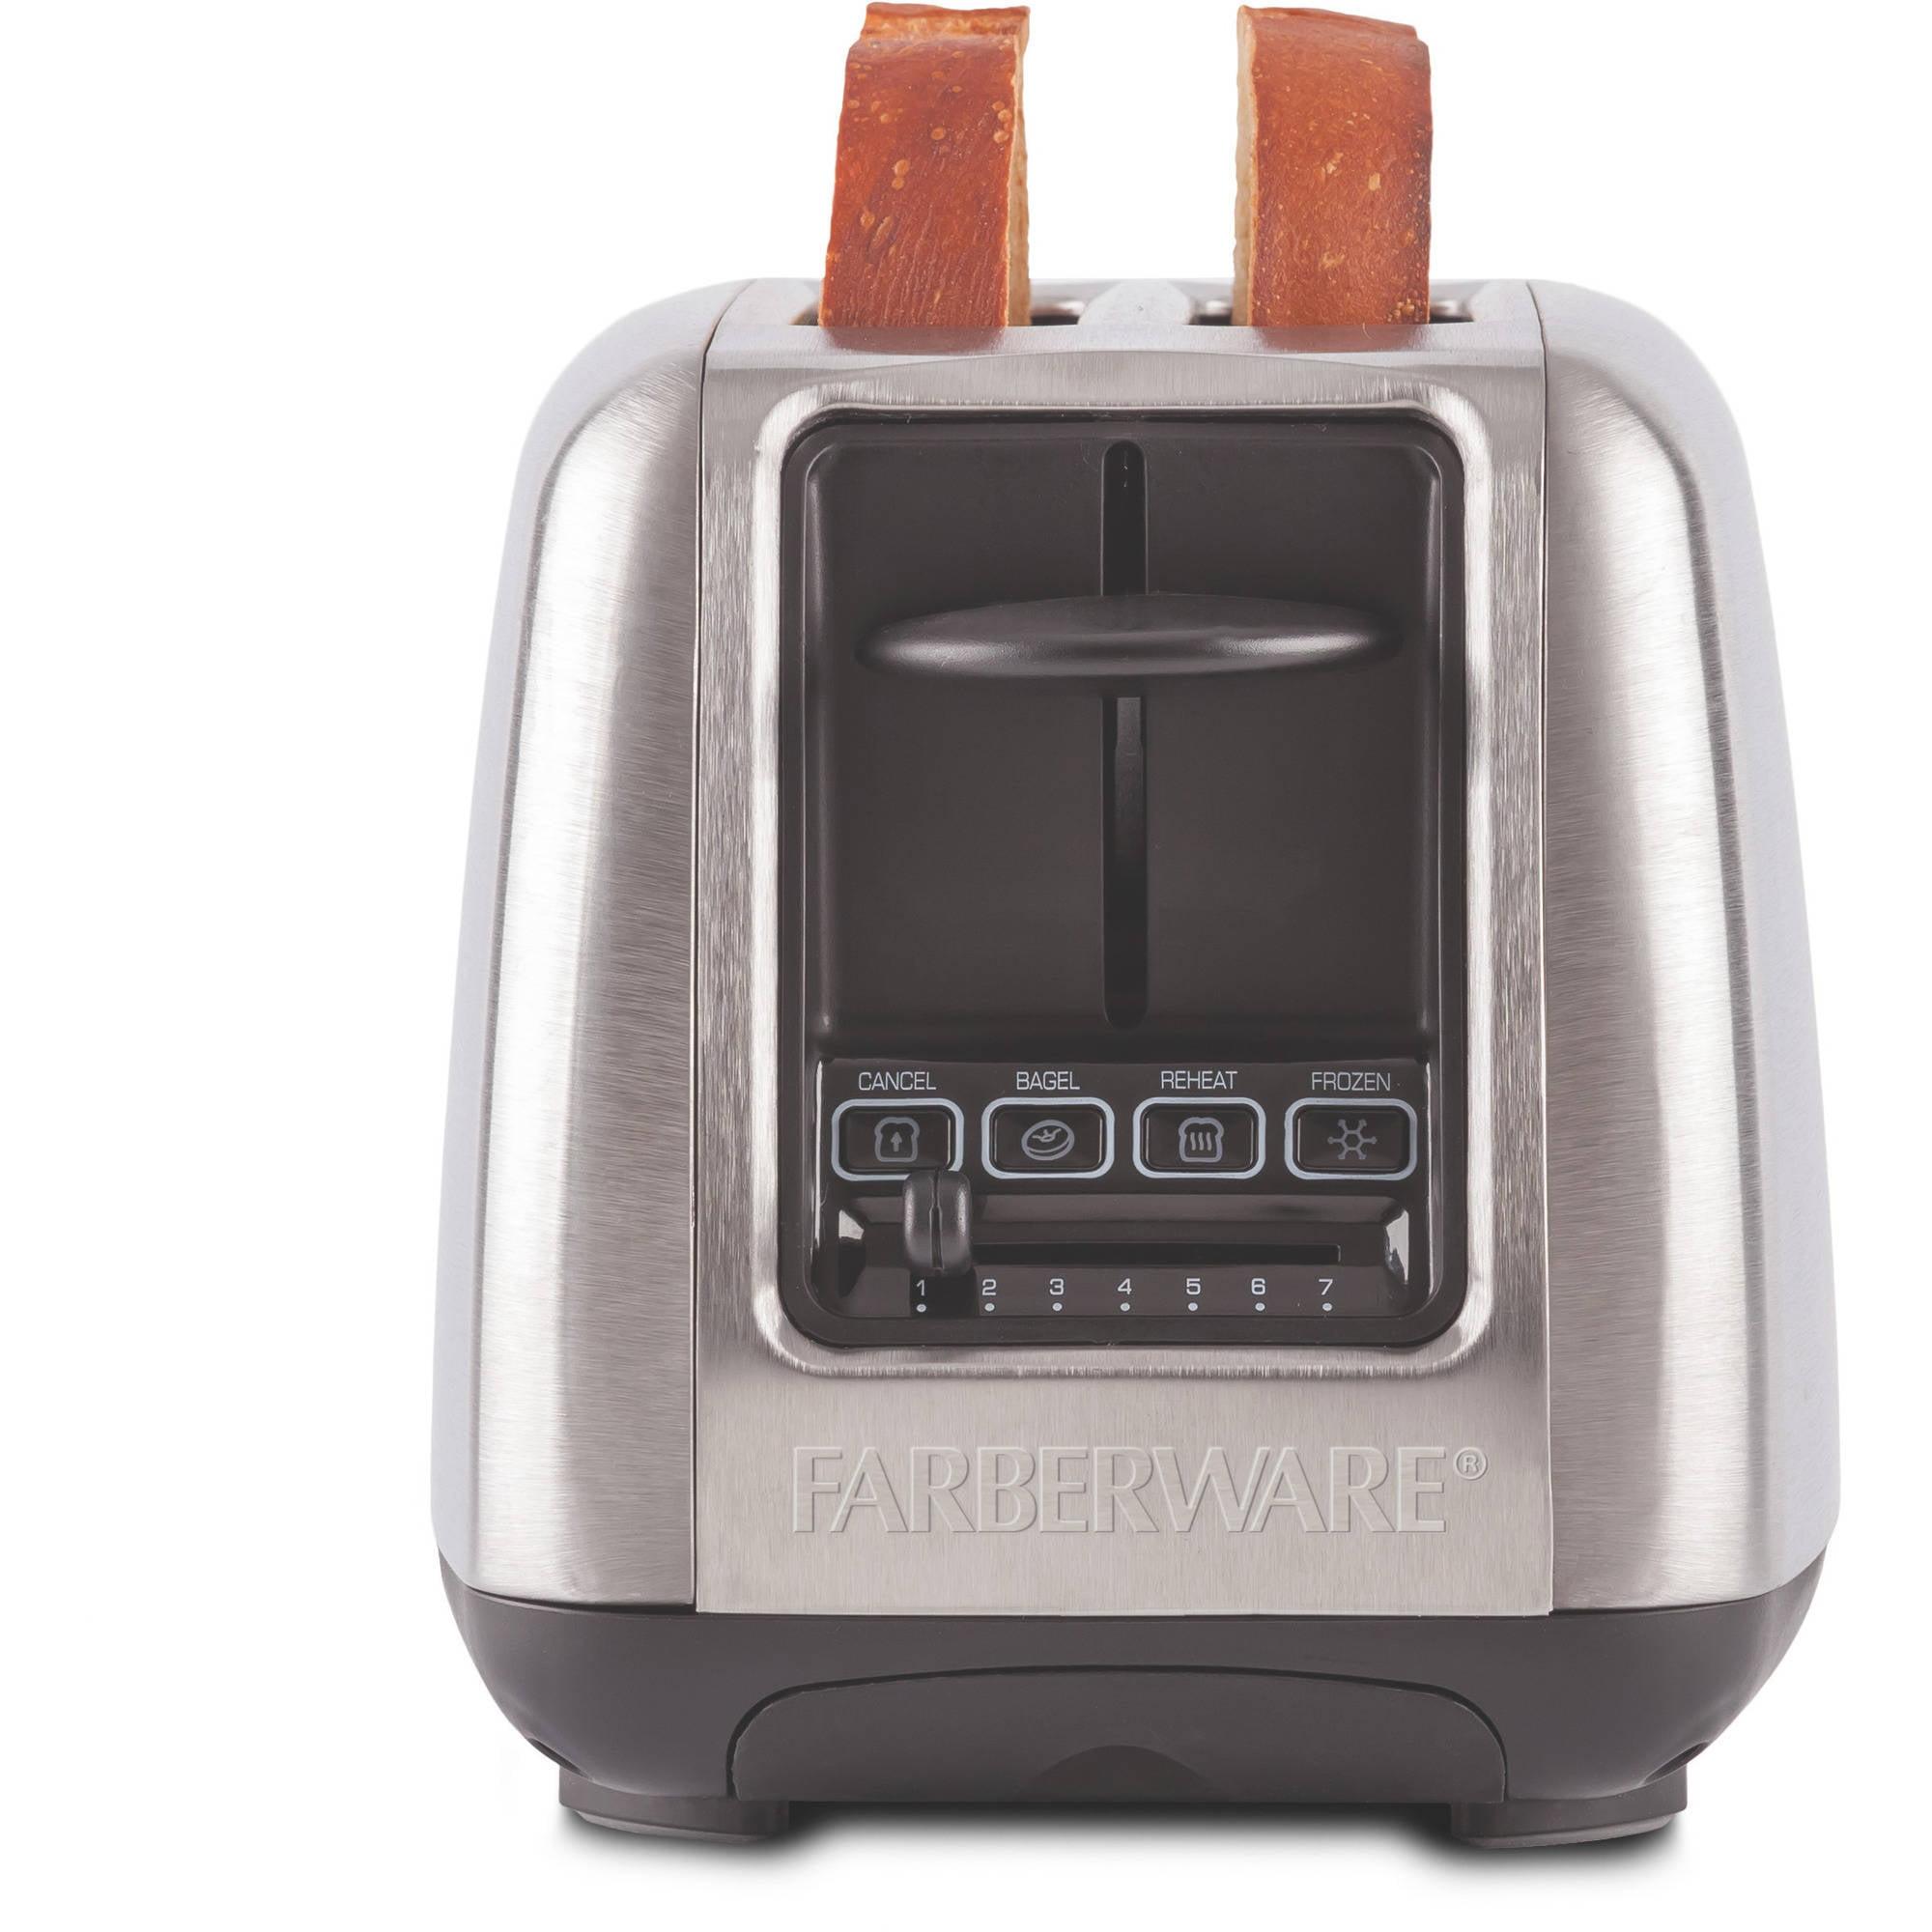 Farberware 2 Slice Toaster